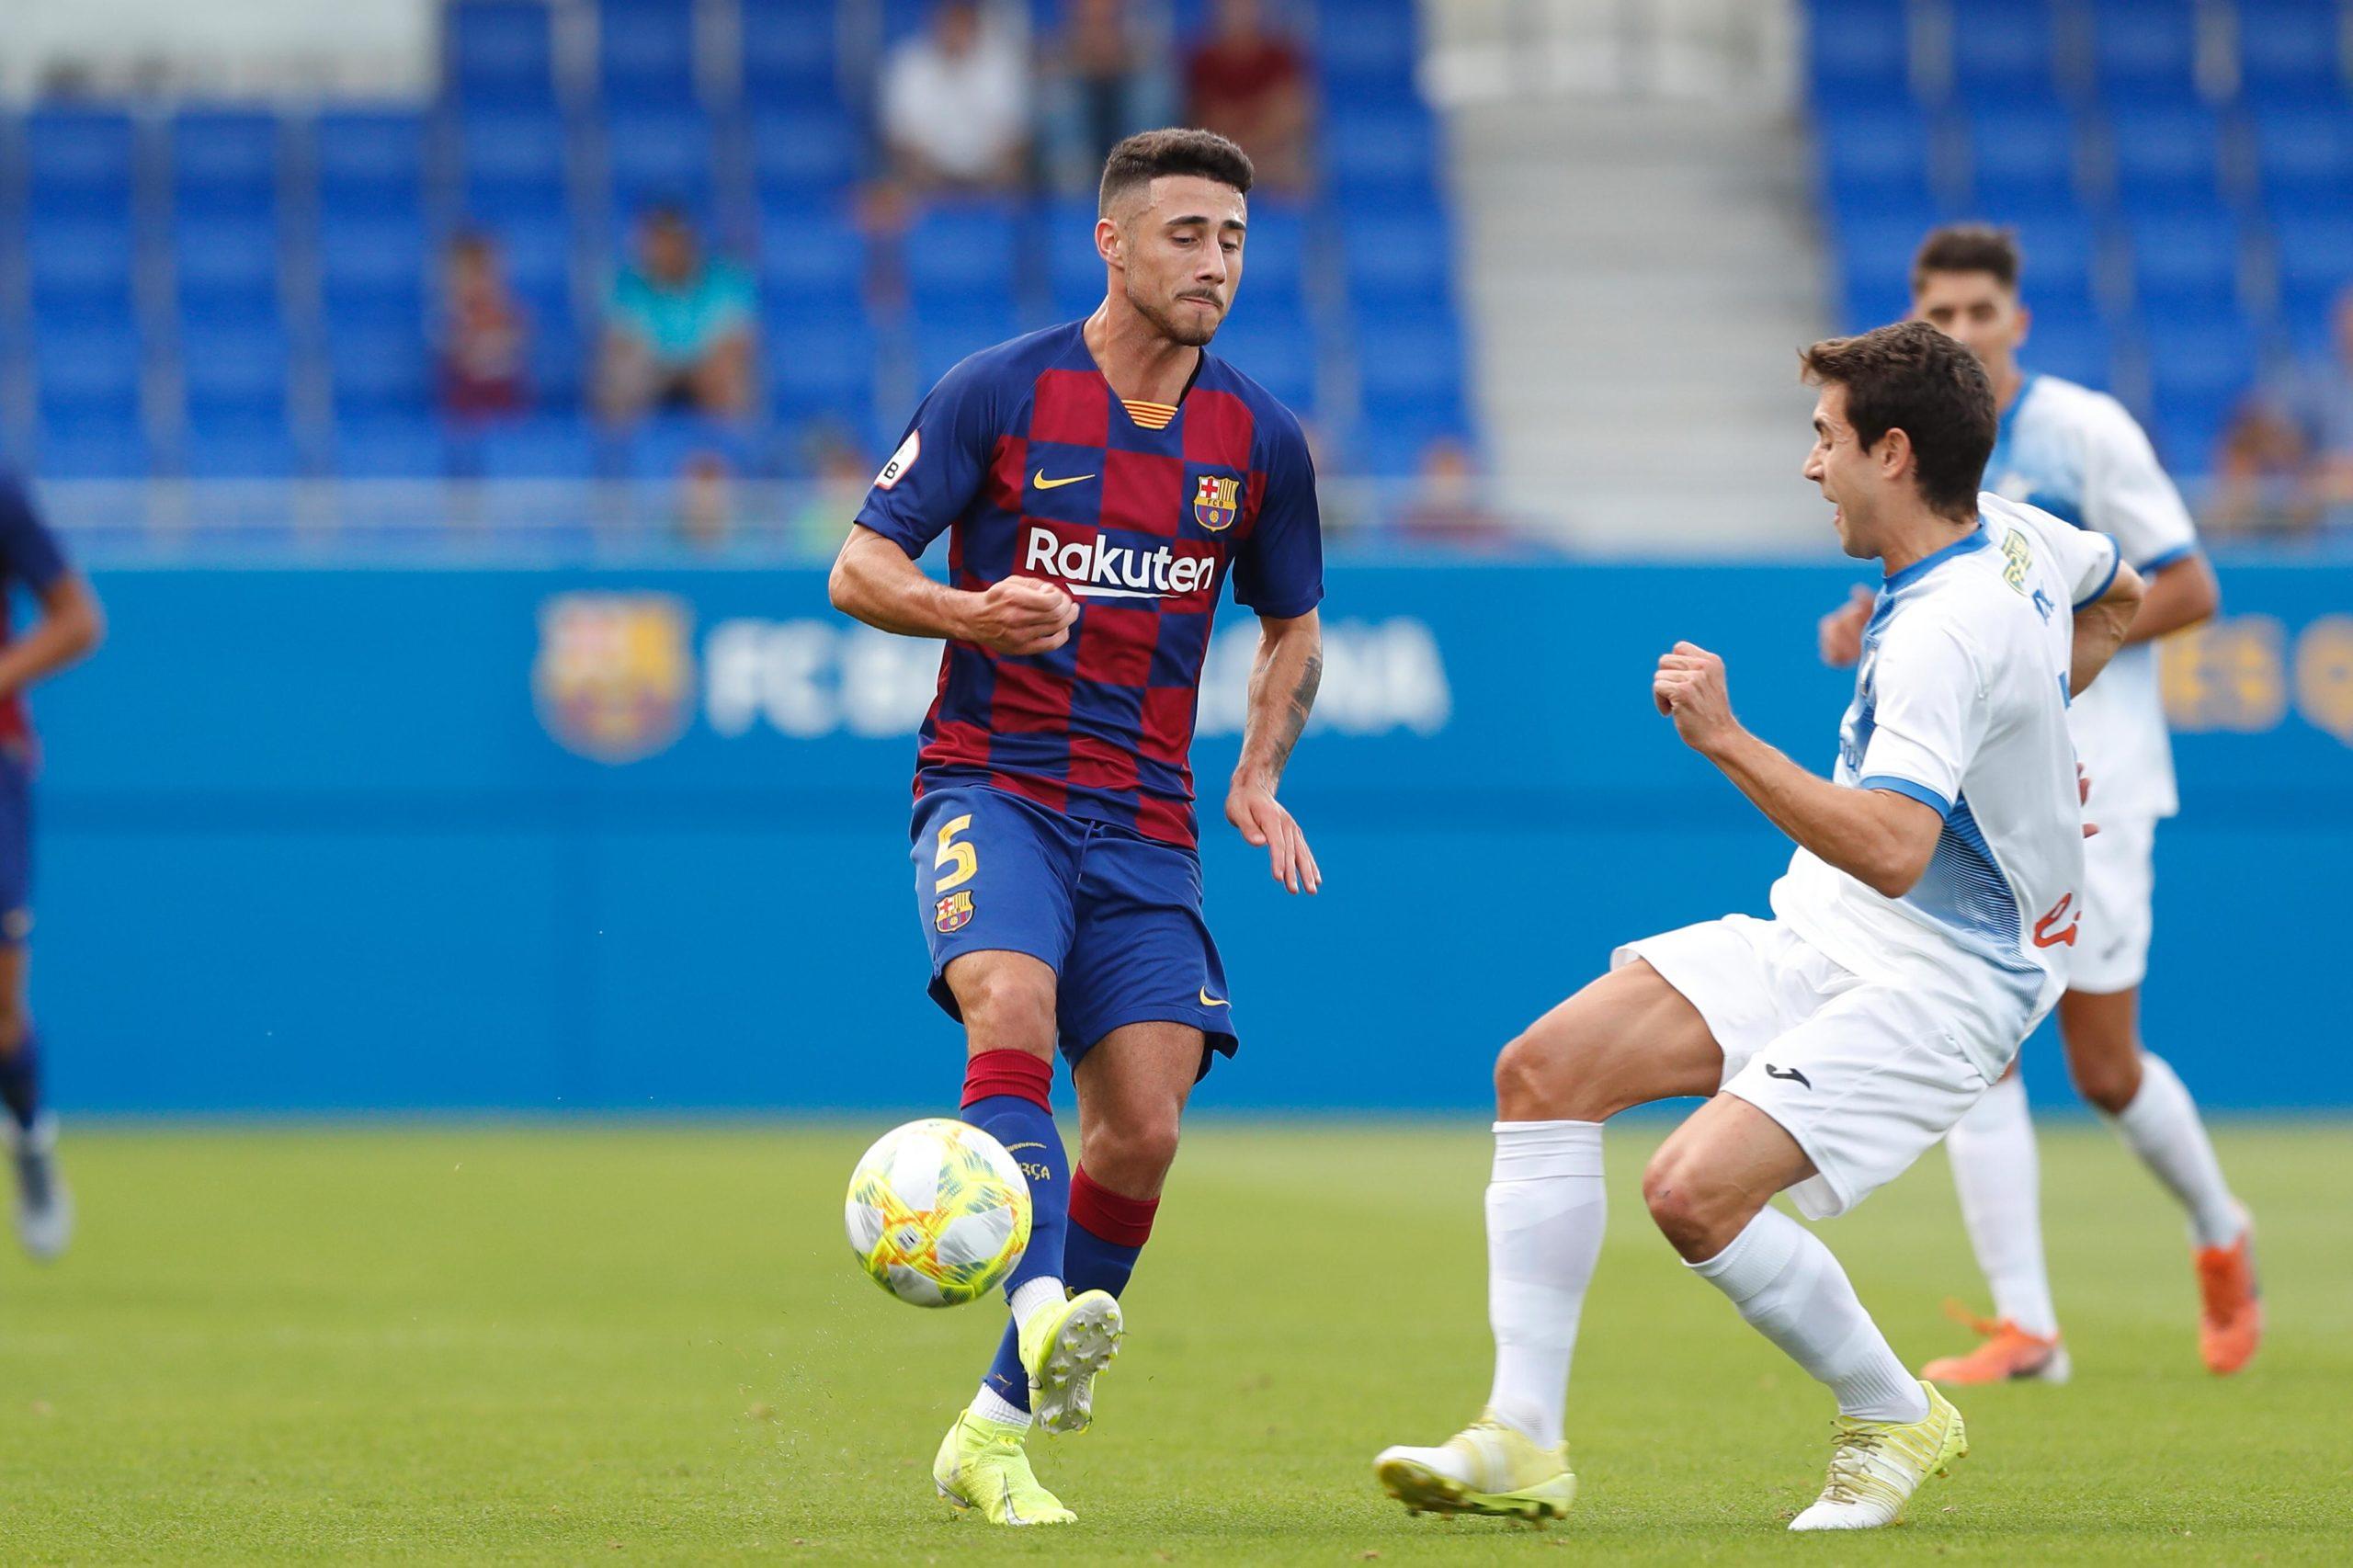 Guillem Jaime Barcelona B SEPTEMBER 14 2019 Football Soccer Spanish La Liga Segunda Divisi